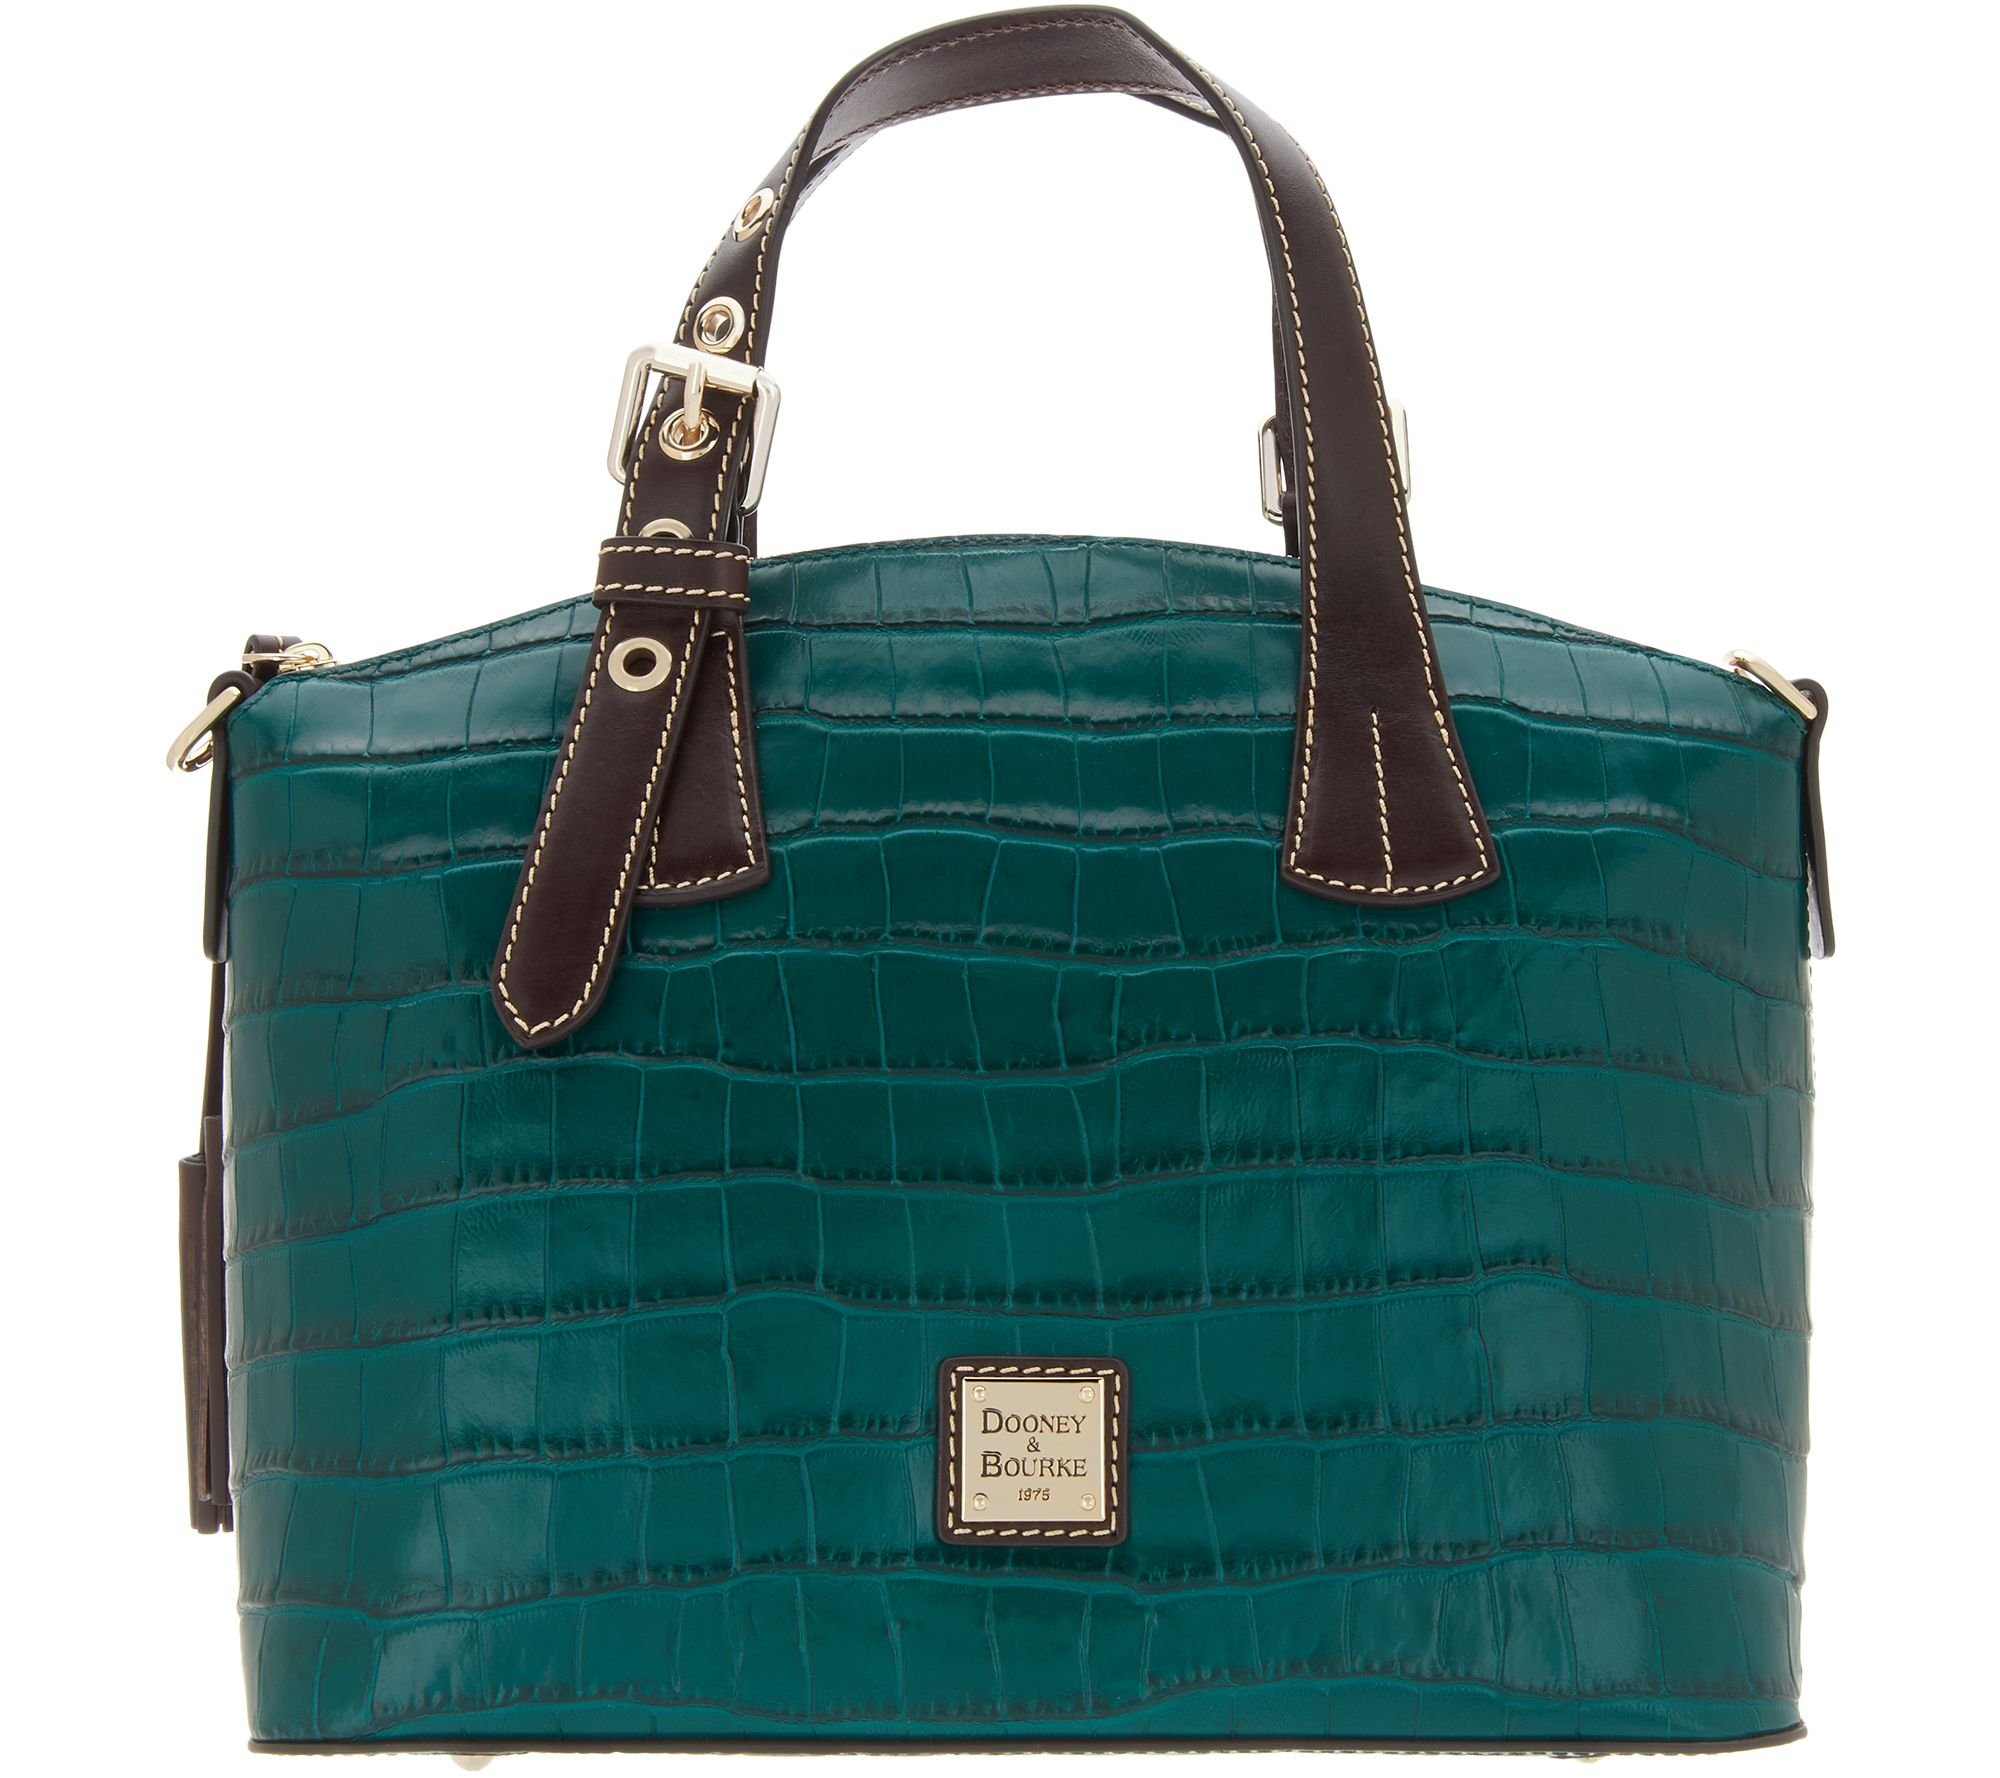 282d12169c4daf Dooney & Bourke Croco Embossed Leather Trina Satchel - Page 1 — QVC.com